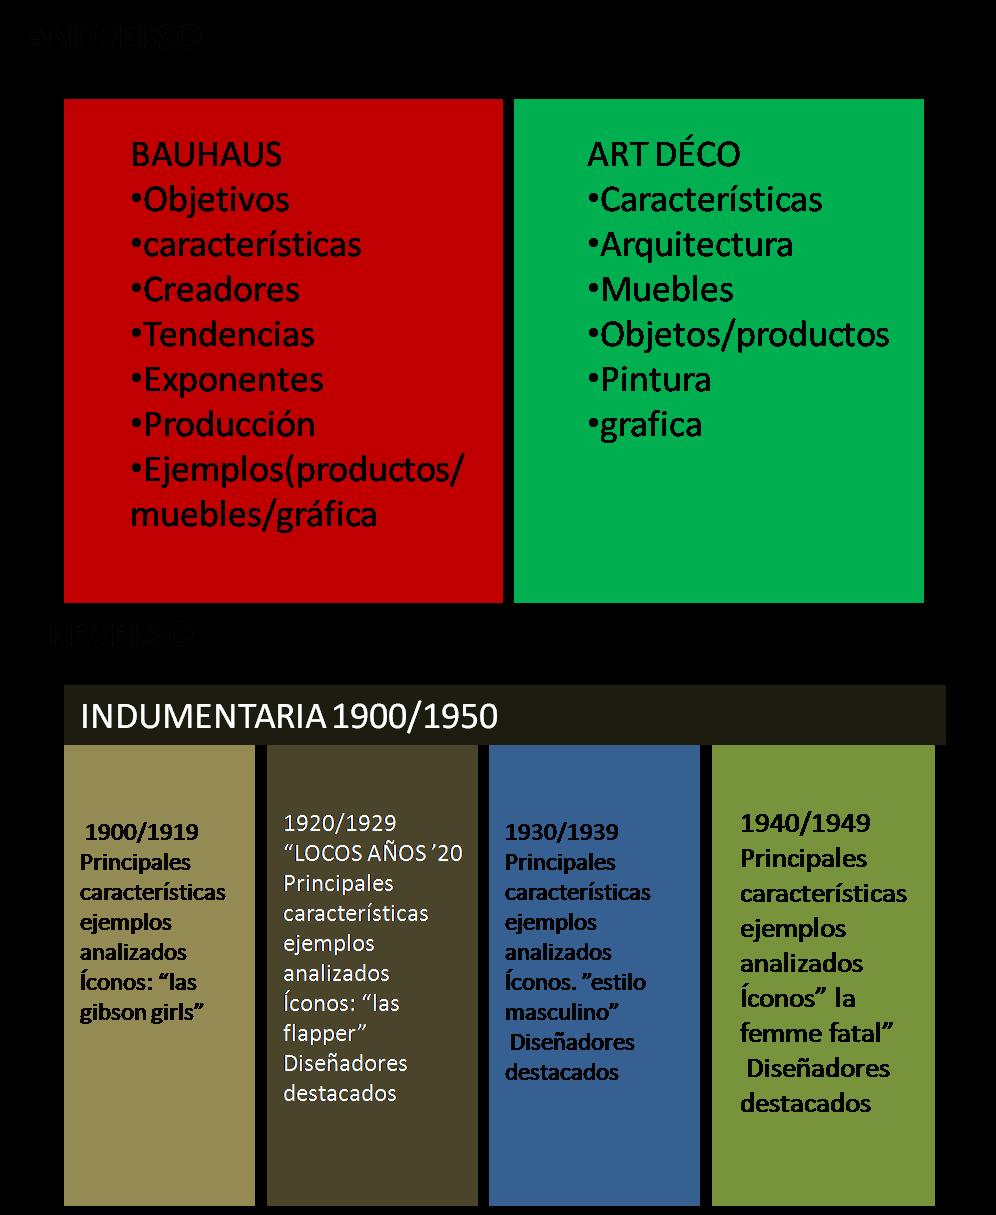 T P N 6 Bauhaus Art Deco Indumentaria 1900 1950 Cultura Del  # Muebles Bauhaus Caracteristicas